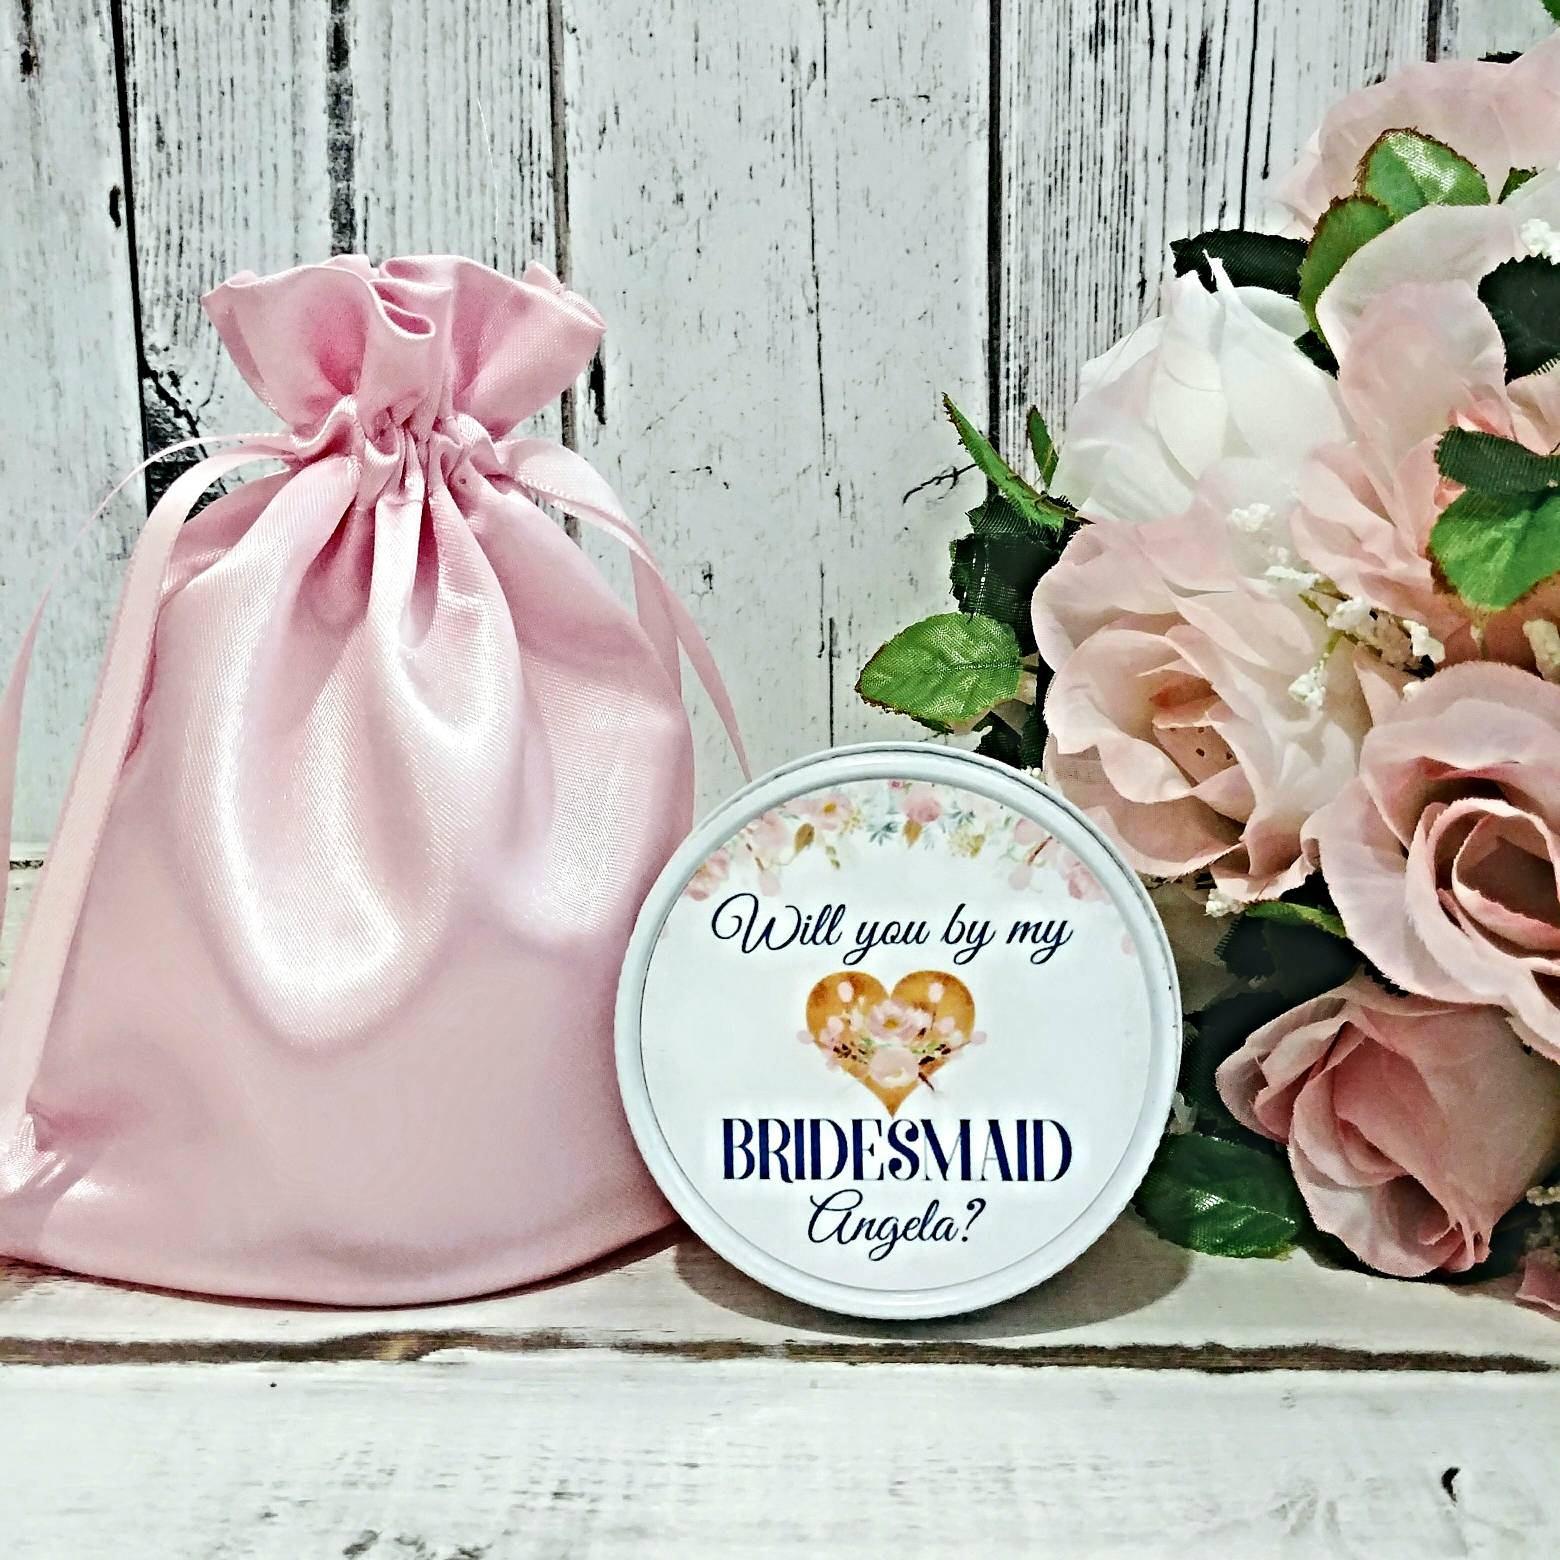 Bridesmaid Proposal Candles - Asking Bridesmaids - Gifts For ...